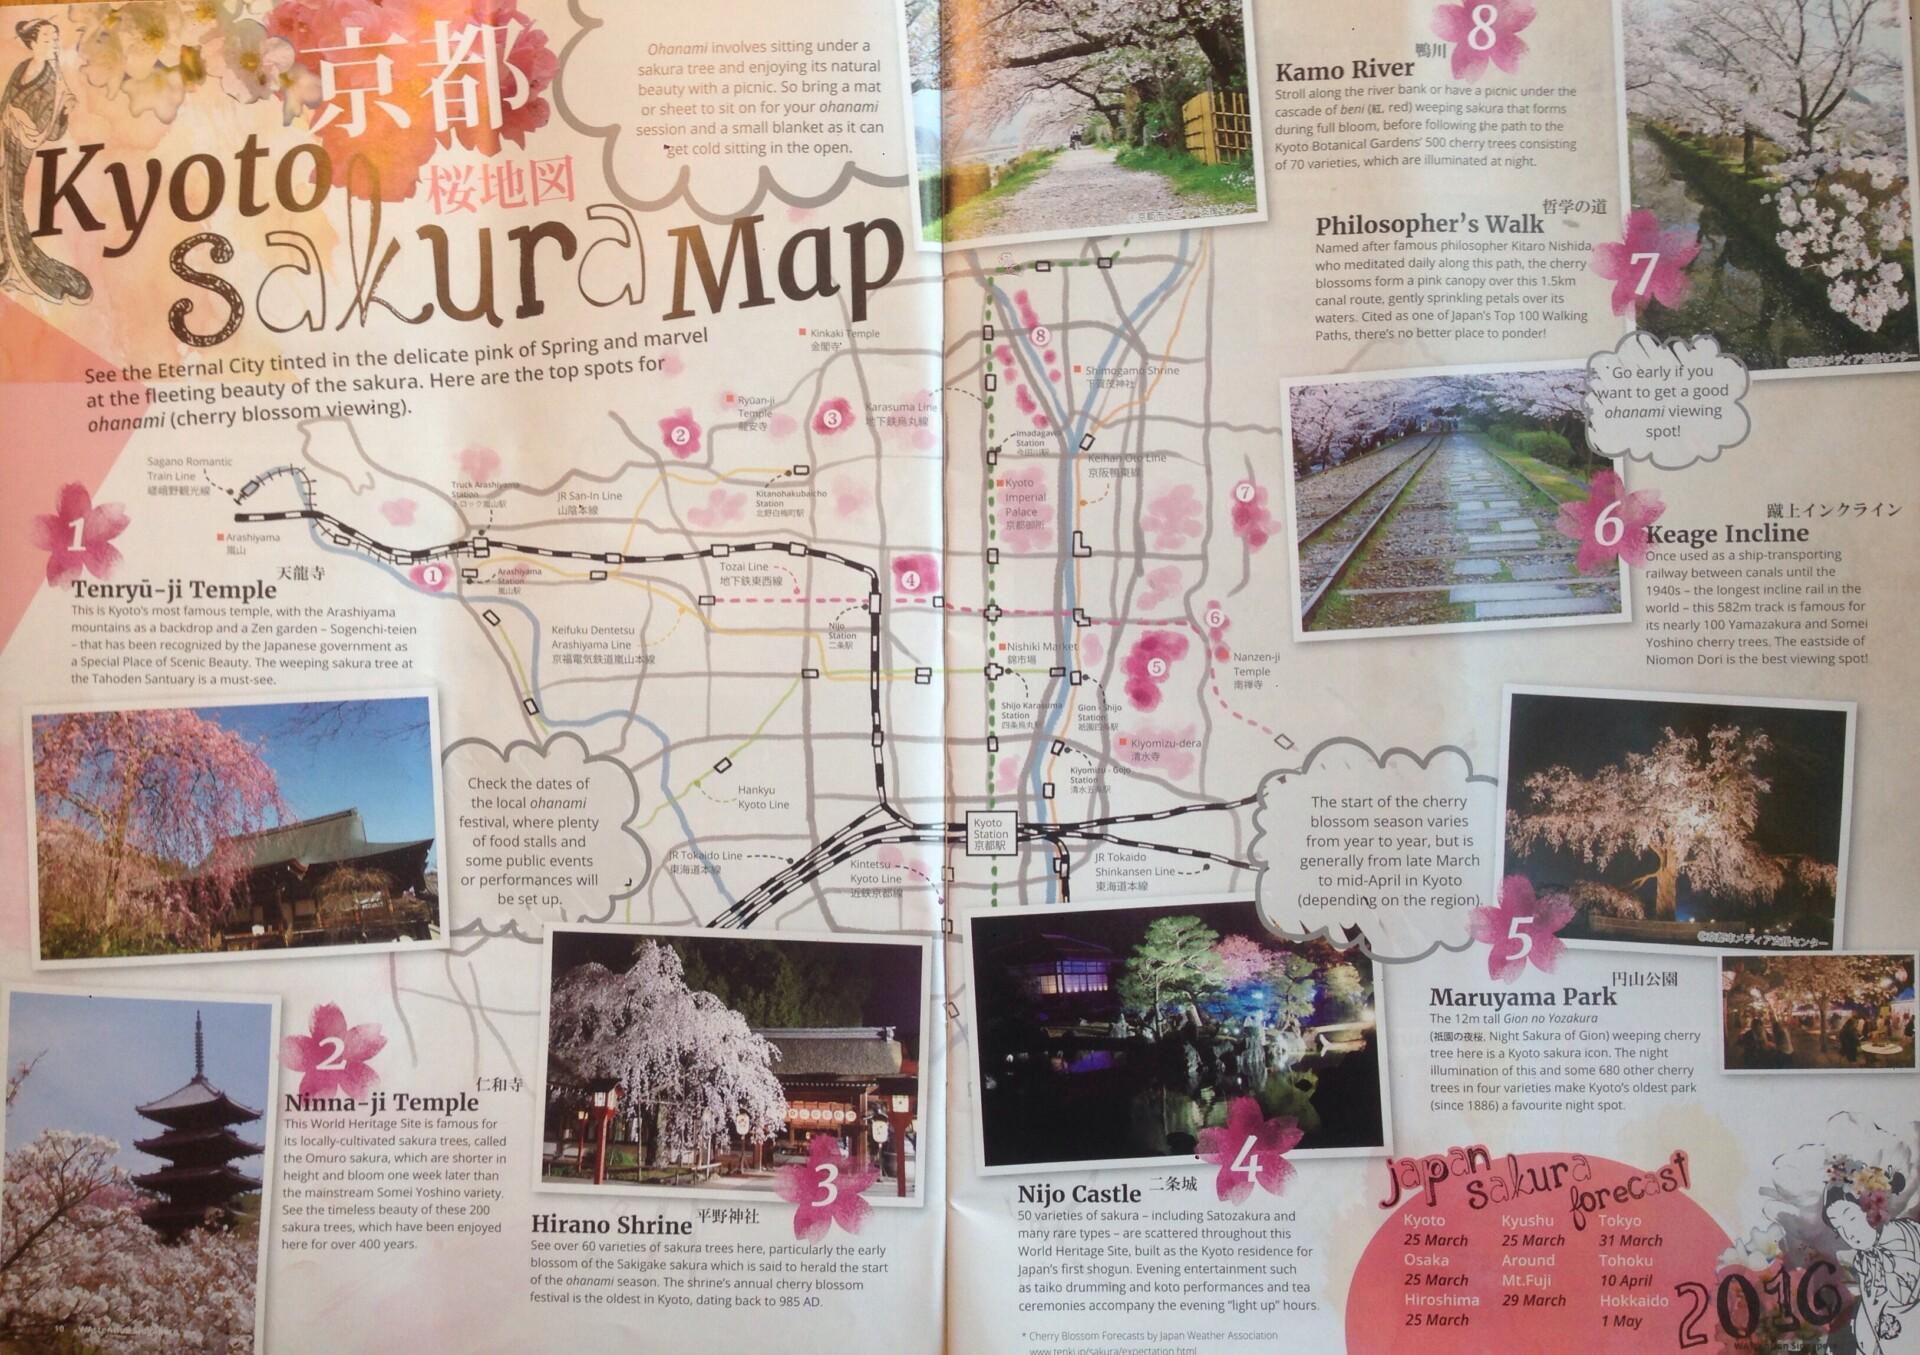 Kyoto Sakura Map